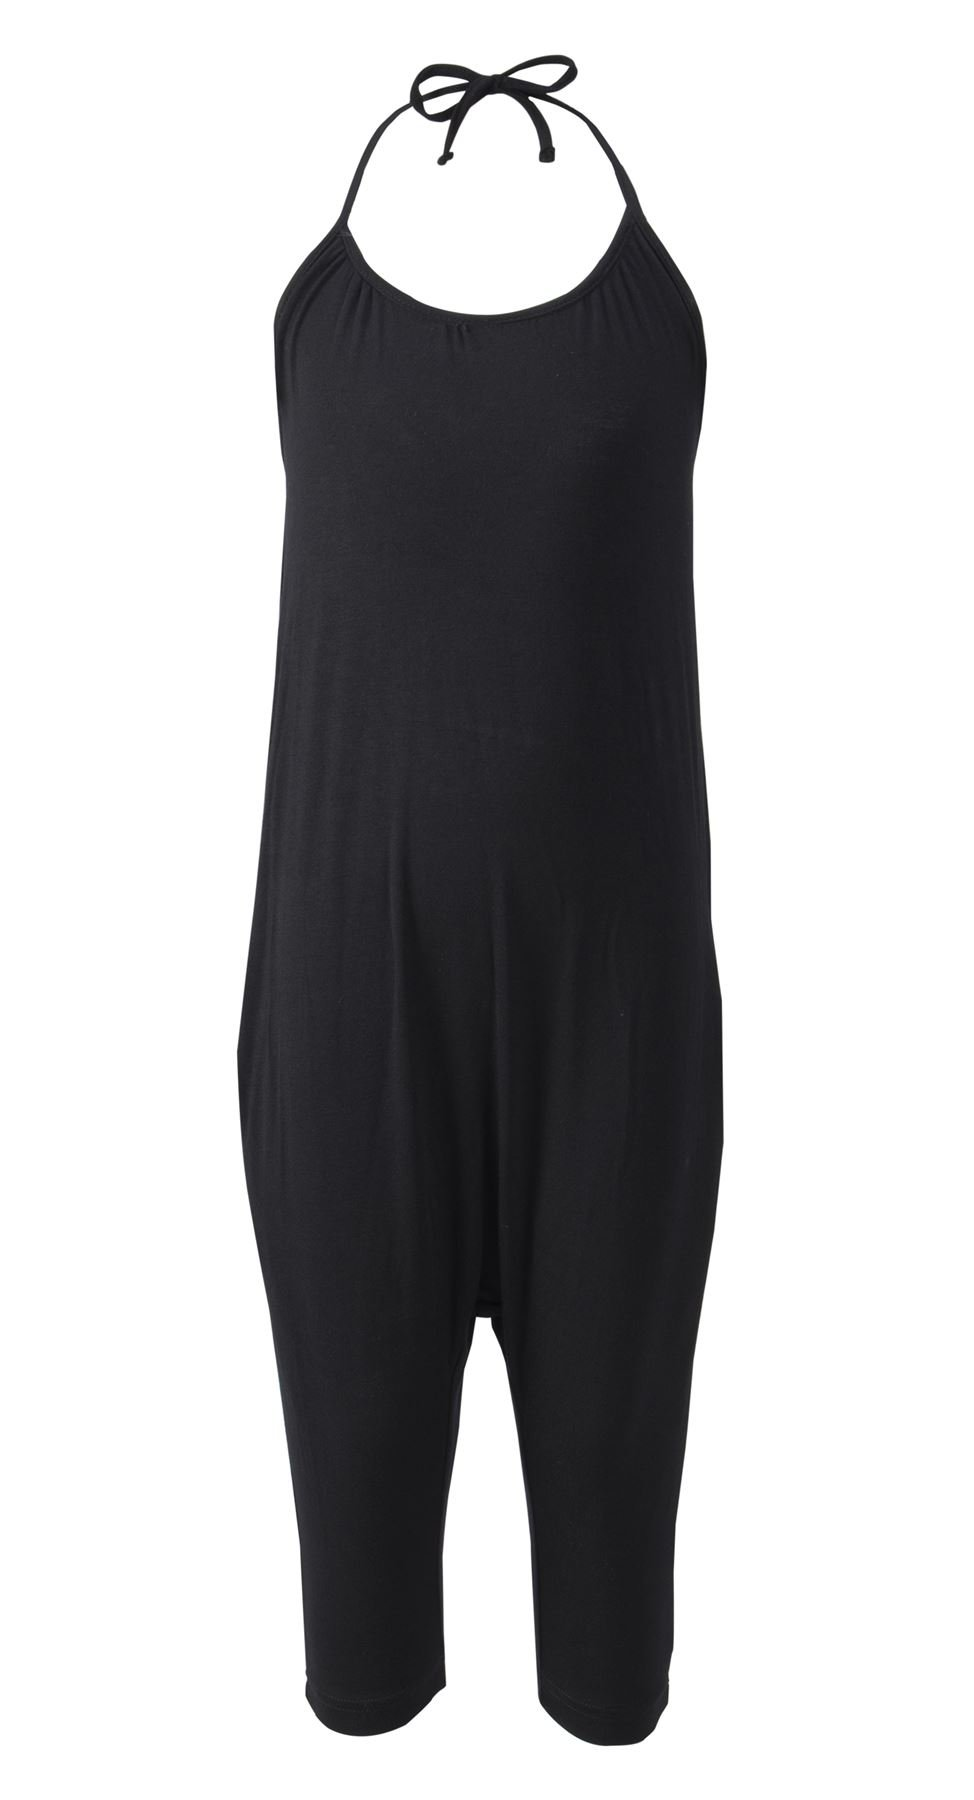 Lofbaz Girls Baby Rayon Straps Black Harem Pants Jumpsuits Rompers Solid Black 3/4Y